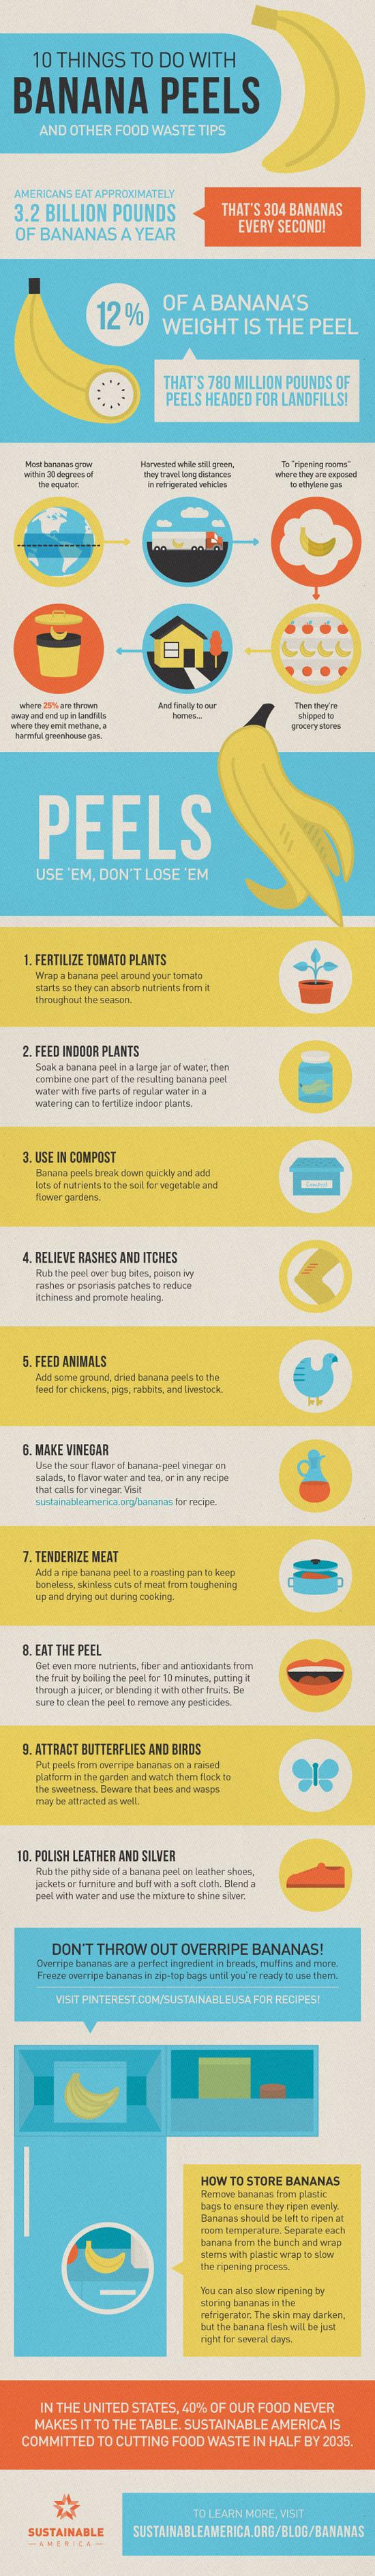 Banana Peel Uses Infographic